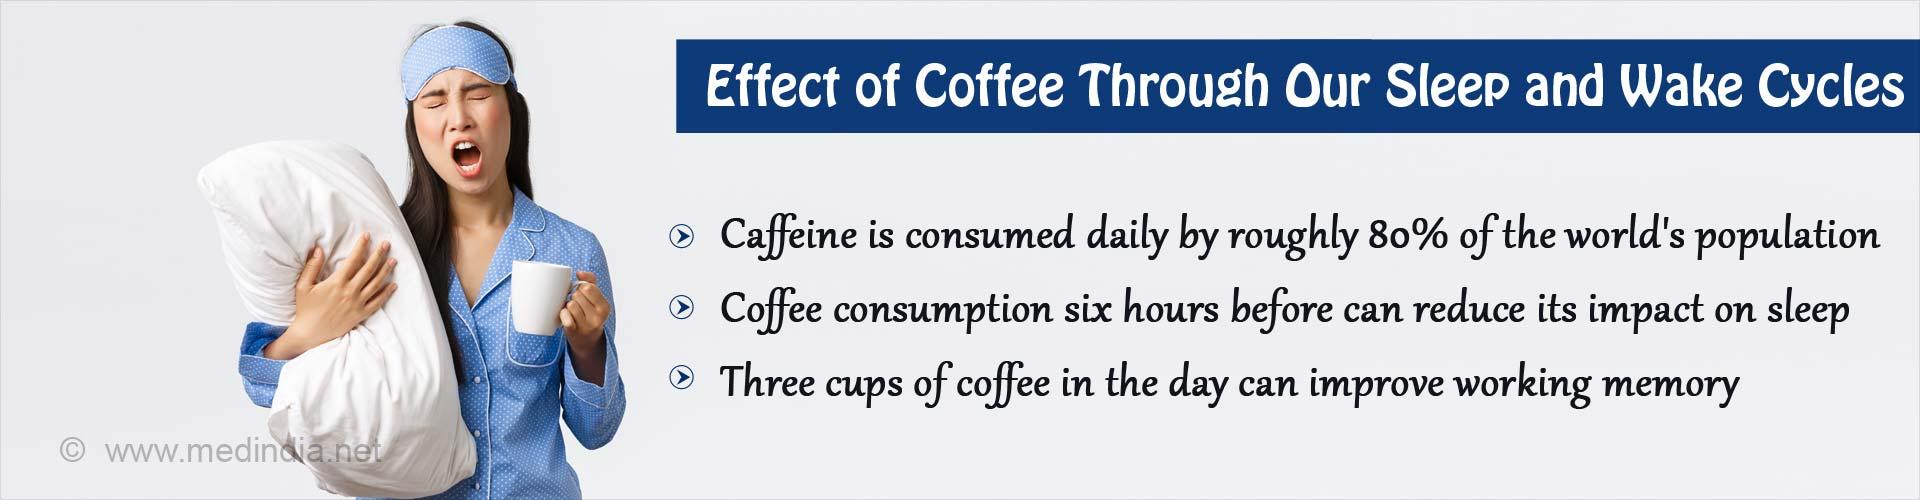 Coffee's Effect on Sleep-Wake Cycle Explored